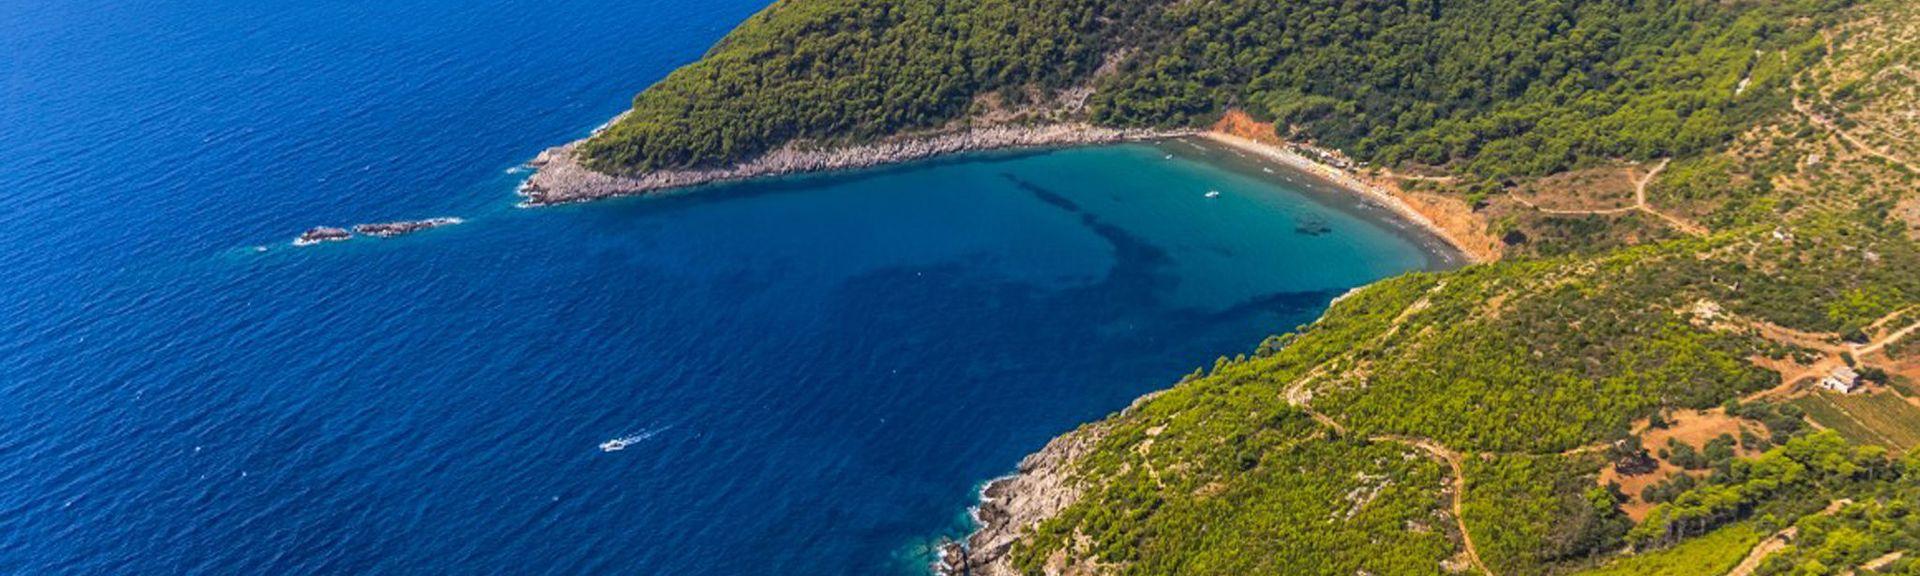 Rožat, Dubrovnik-Neretva, Kroatia